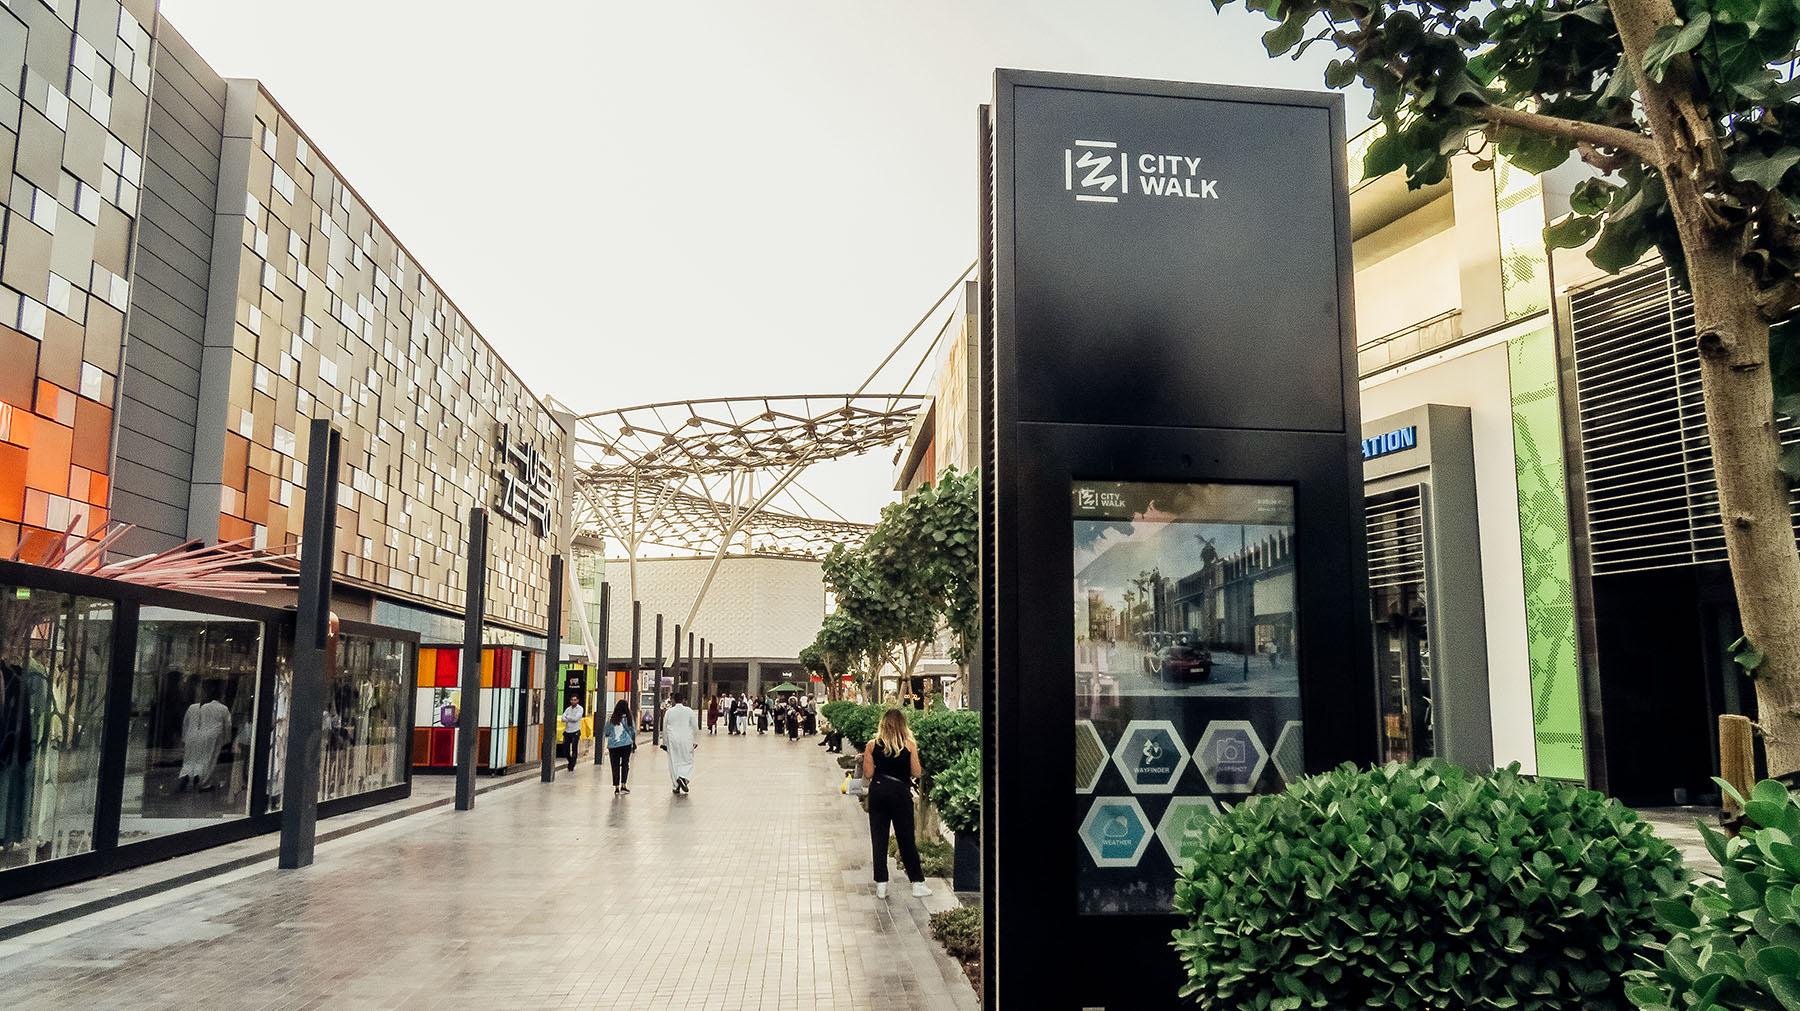 Orient Kreuzfahrt Dubai City Walk Eingang